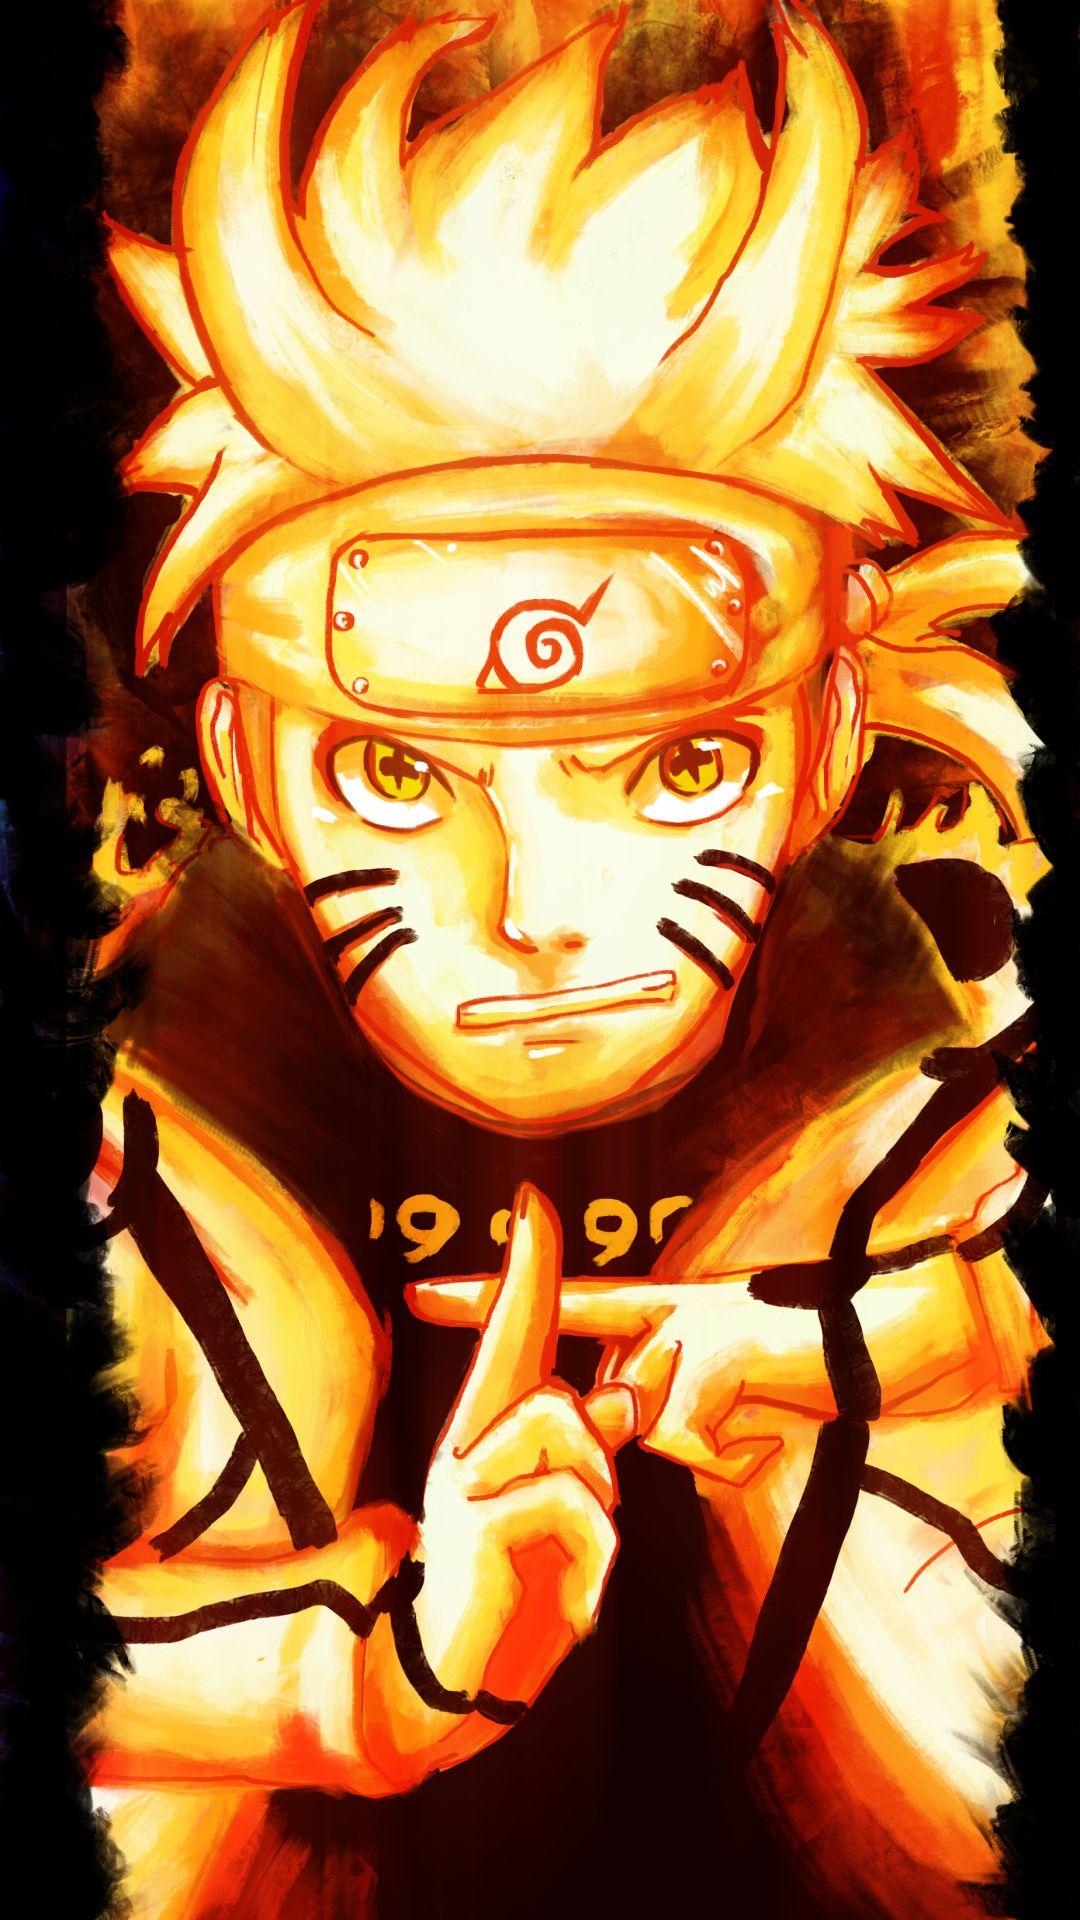 35 Naruto Mobile Wallpapers Download at WallpaperBro